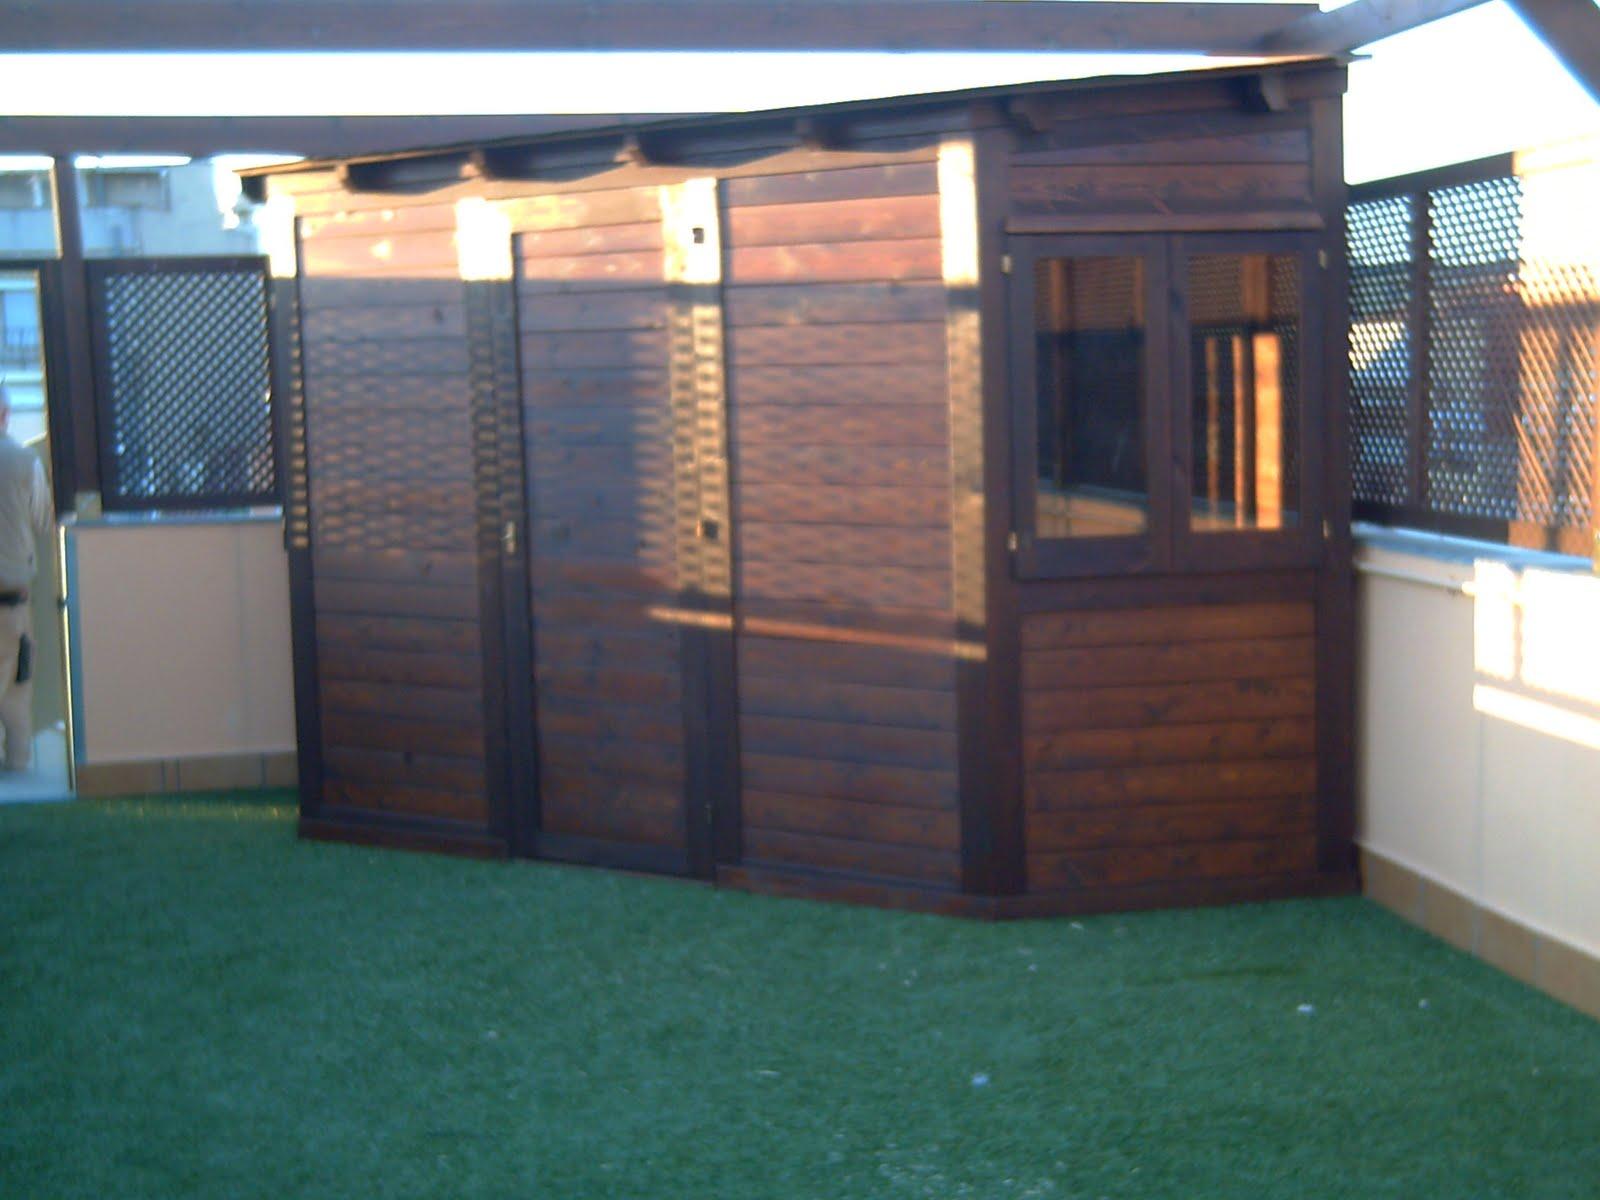 Ca uelo e hijos carpinteria s c p terraza y jardin for Caseta madera terraza